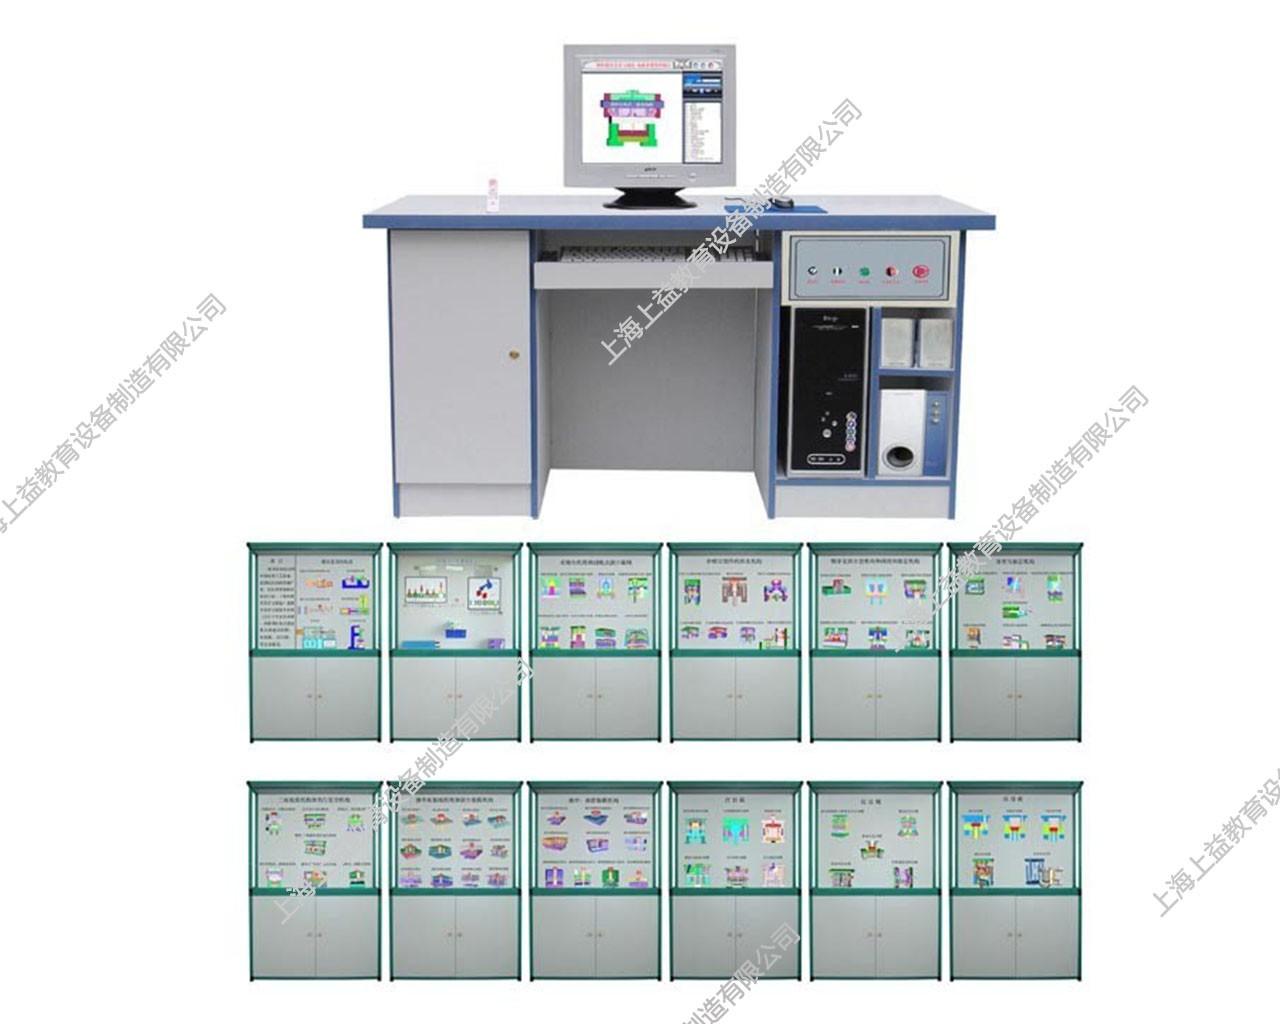 SYGLG-115 塑料磨具设计与制造语音多功能控制陈列柜